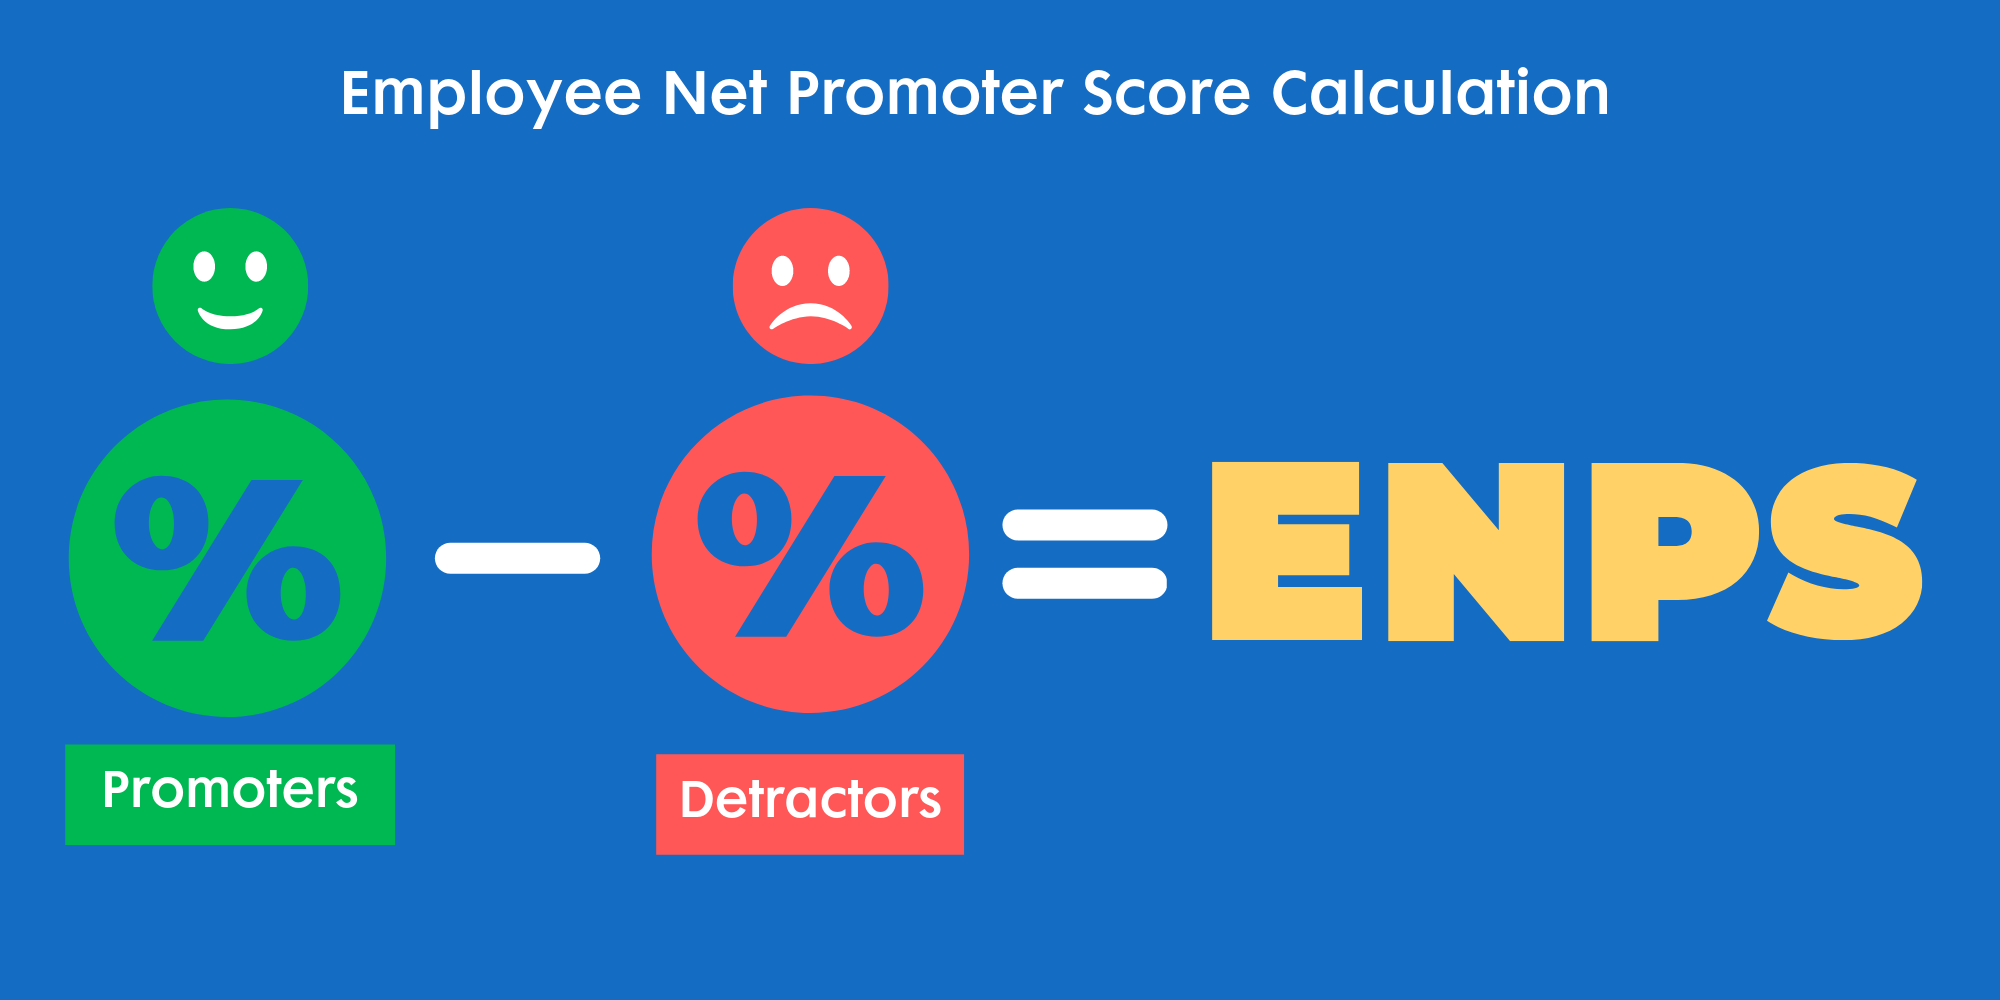 Employee Net Promoter (ENPS) Score Calculation